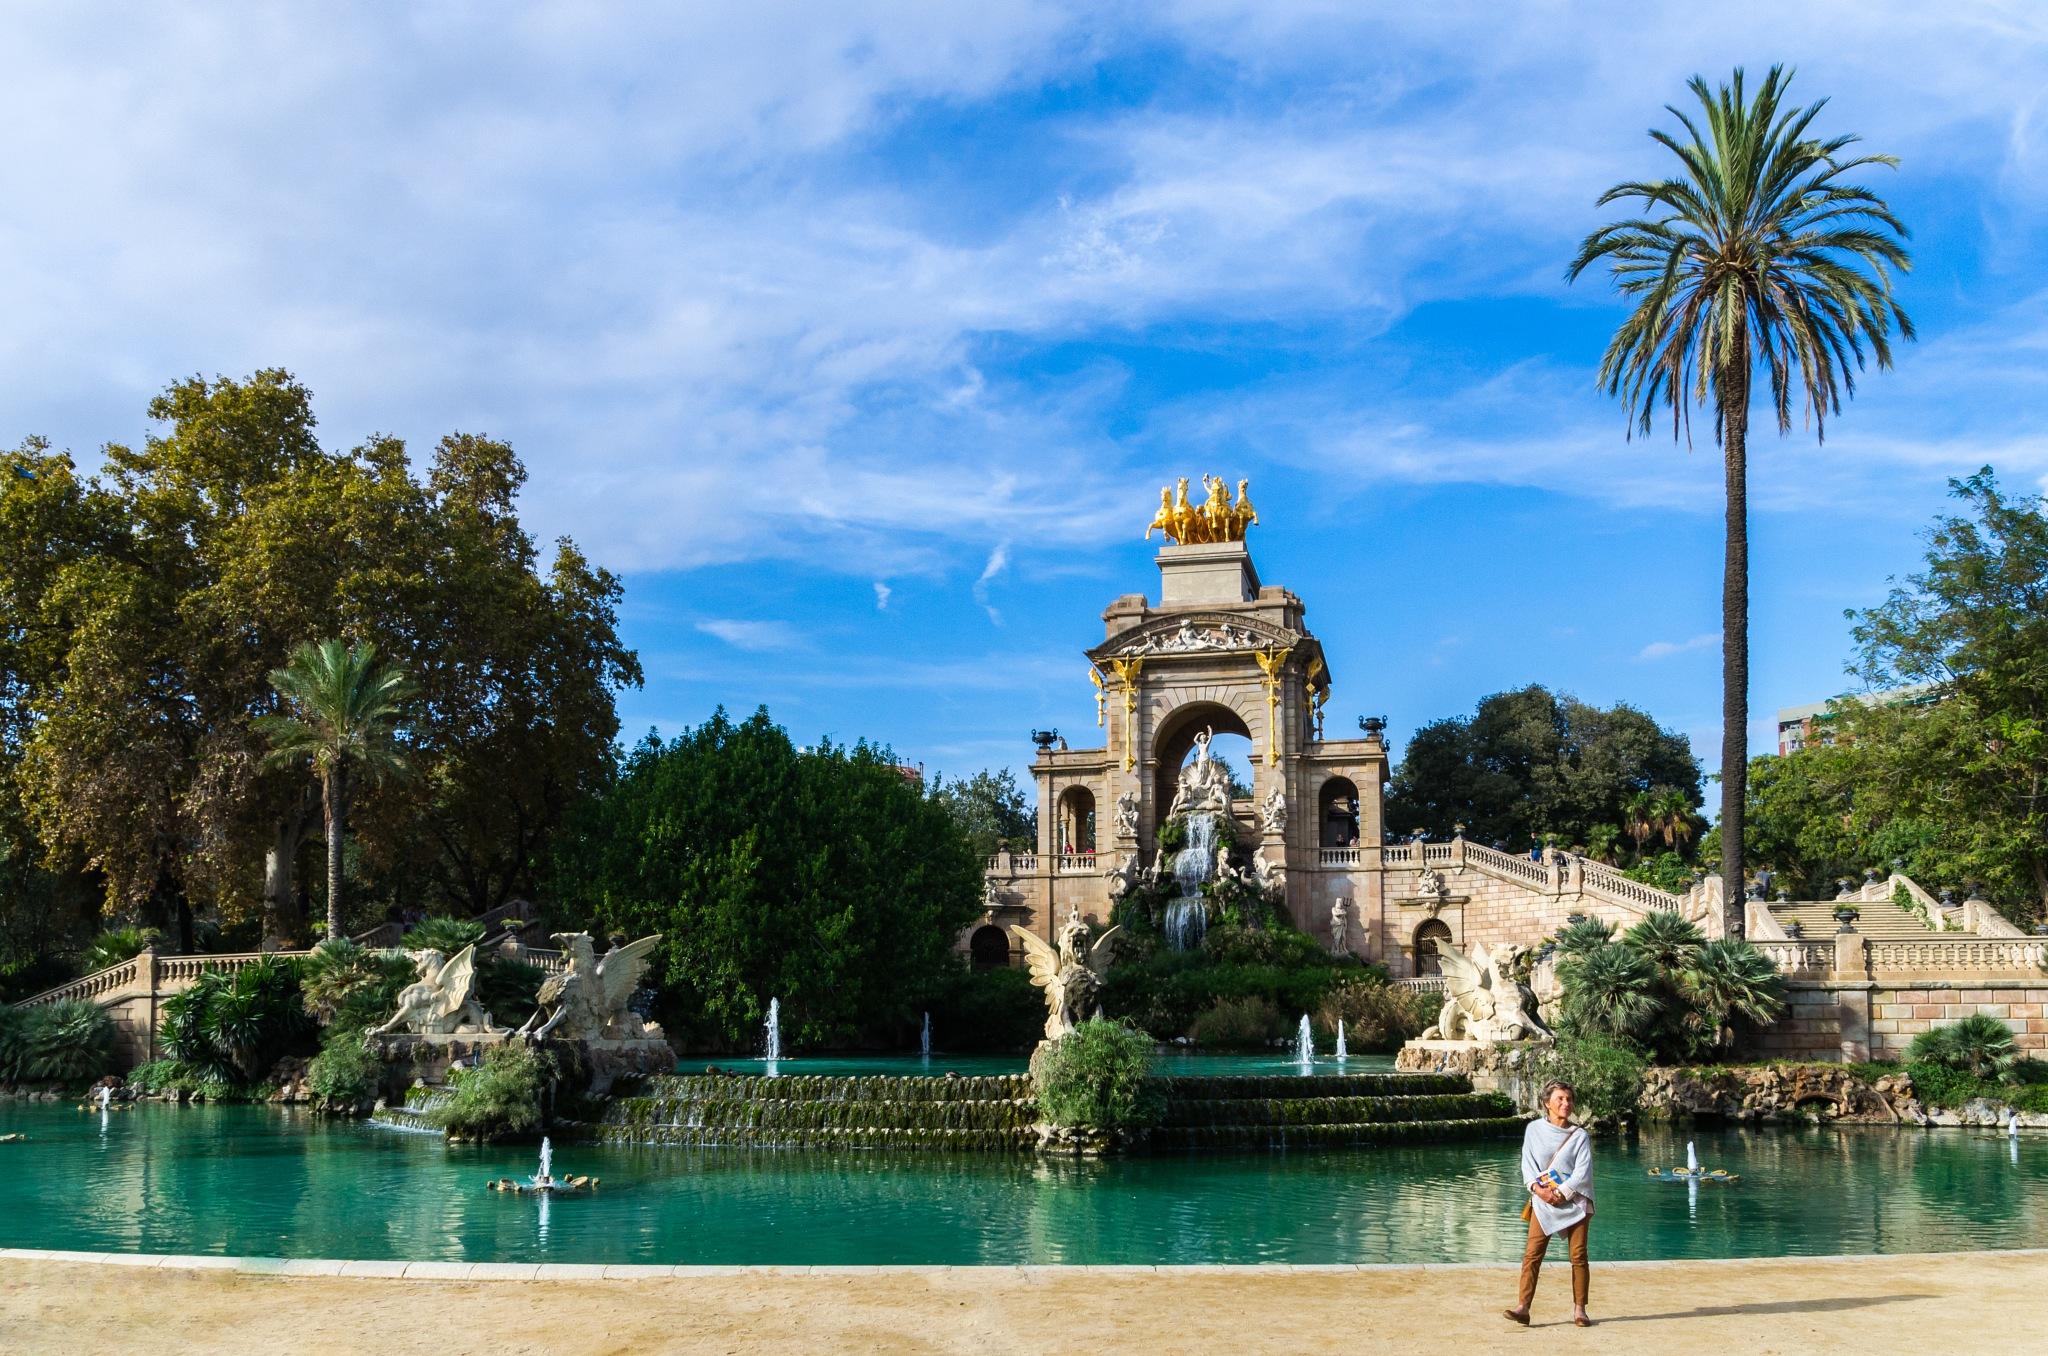 Cascada Monumental - Barcelona by raymond.vanharen